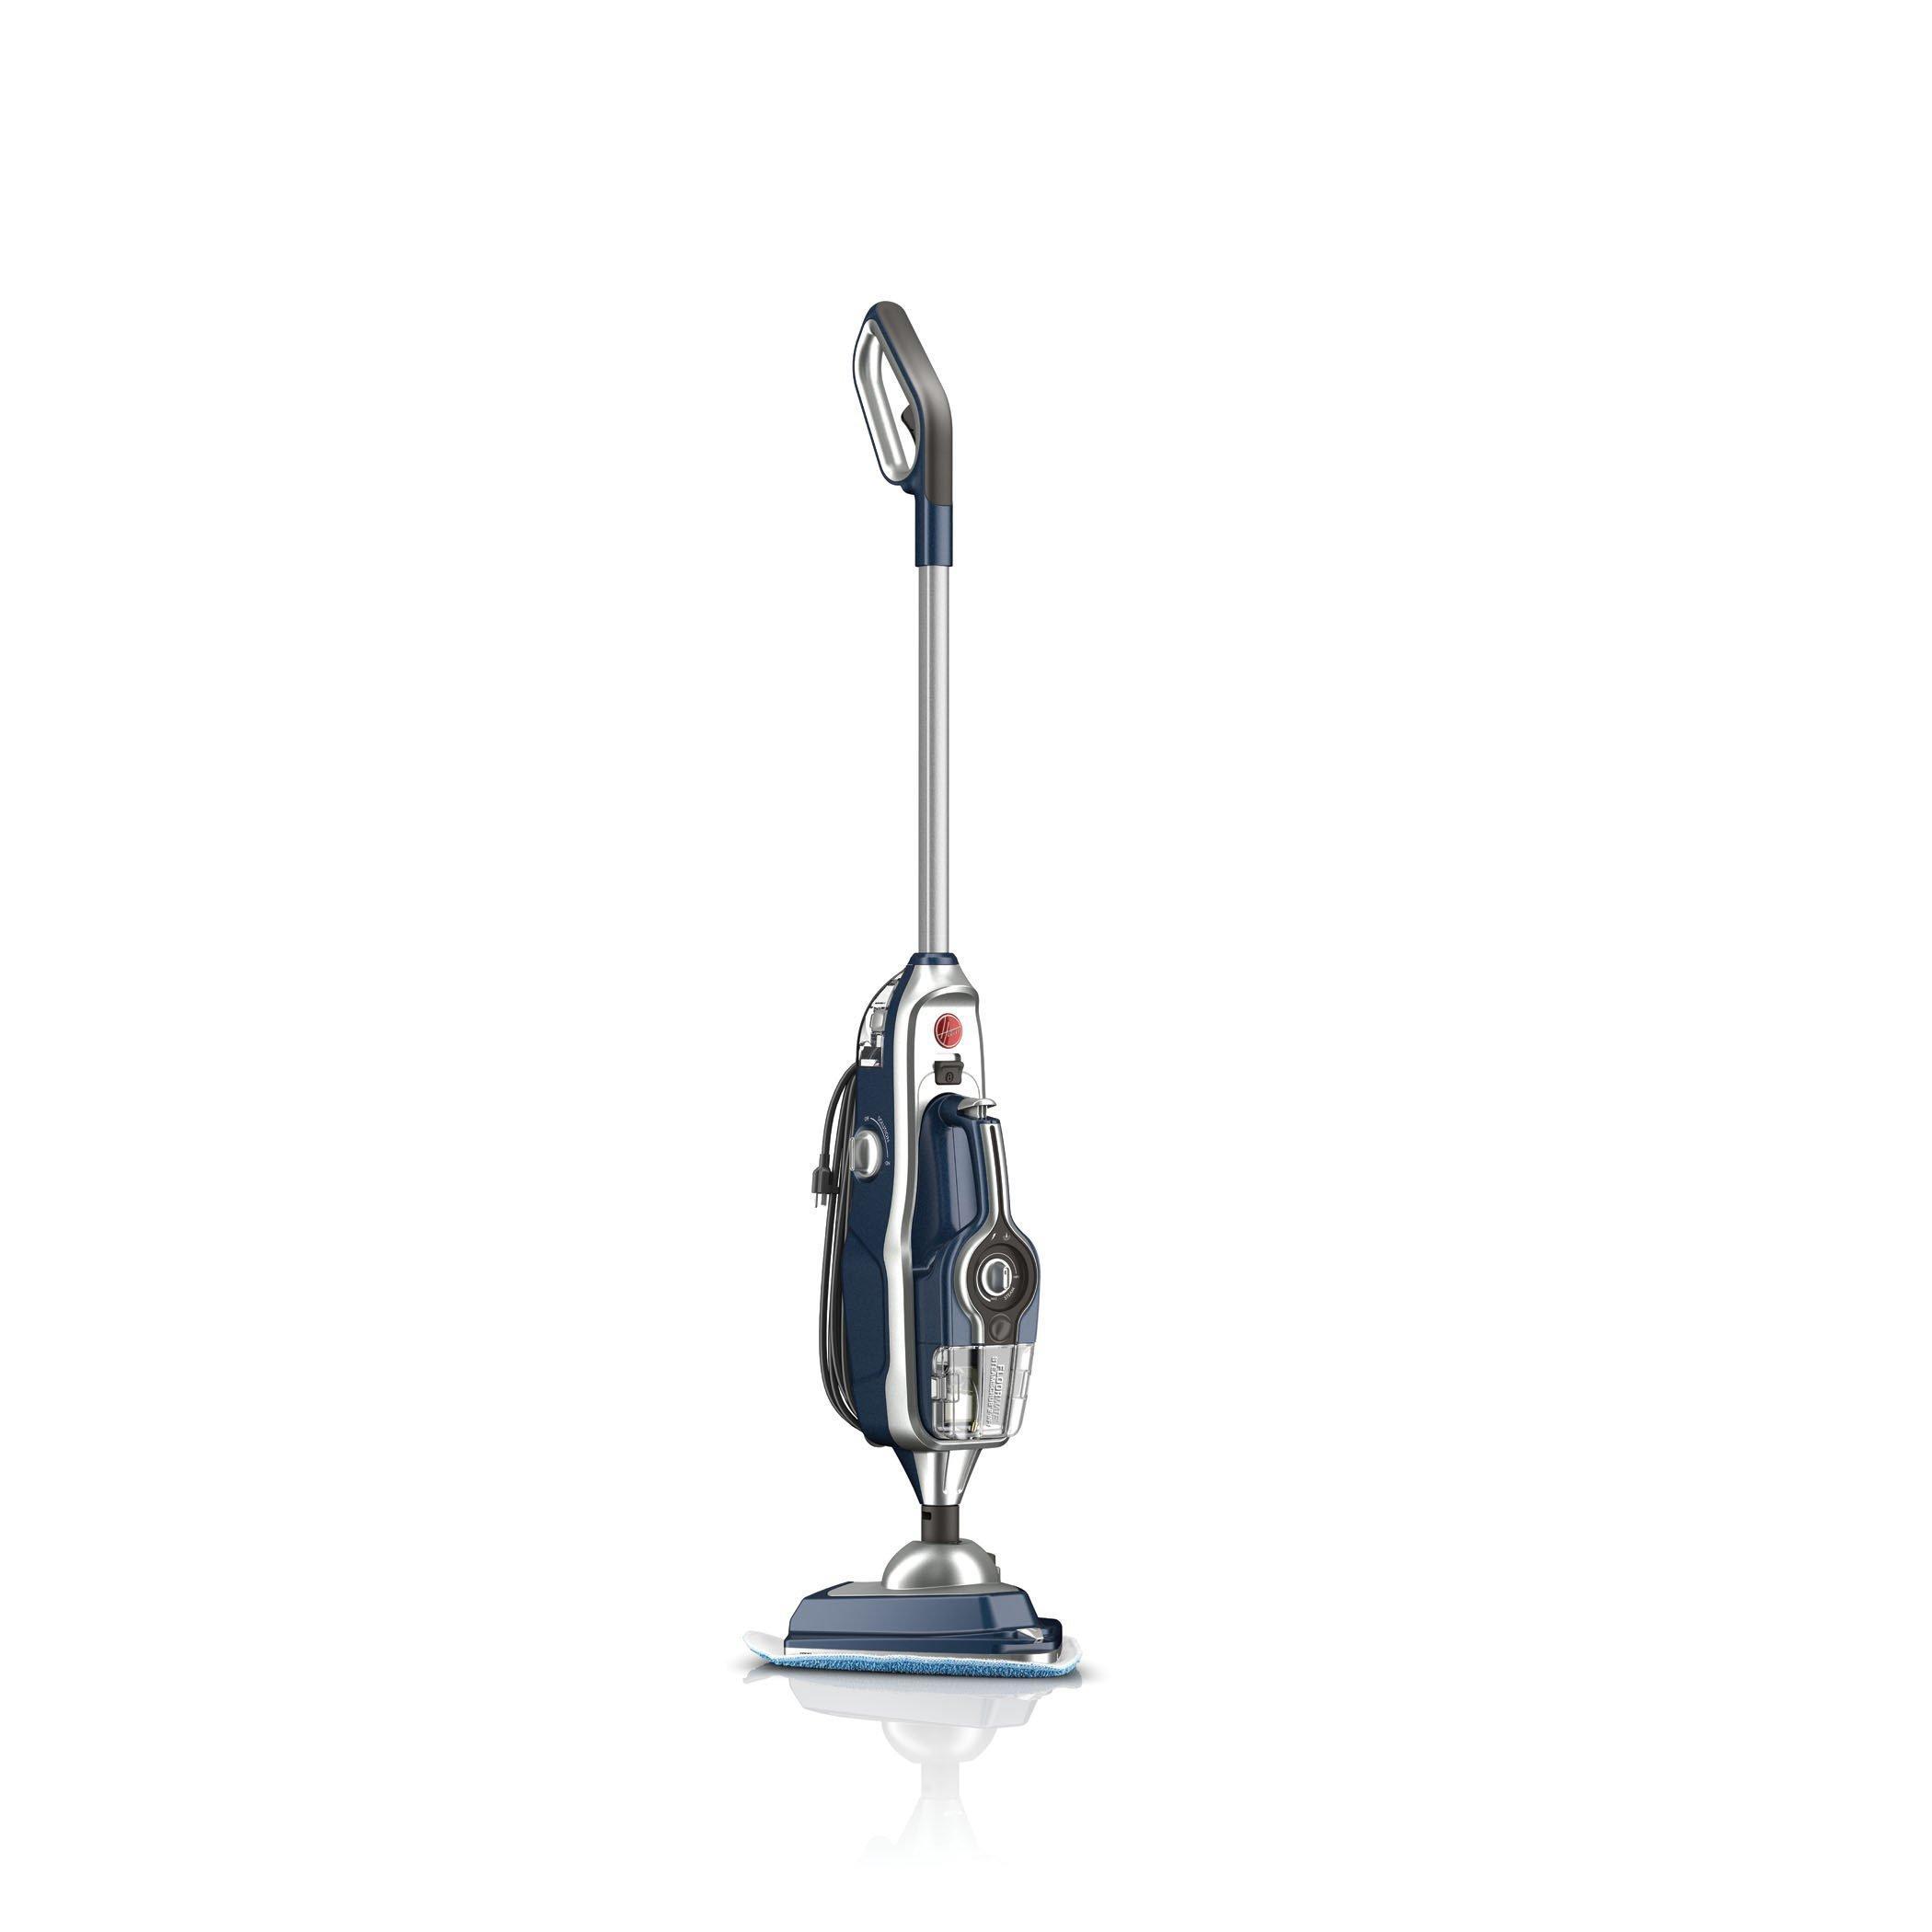 Hoover Steamscrub 2 In 1 Steam Mop Wh20445 Ebay